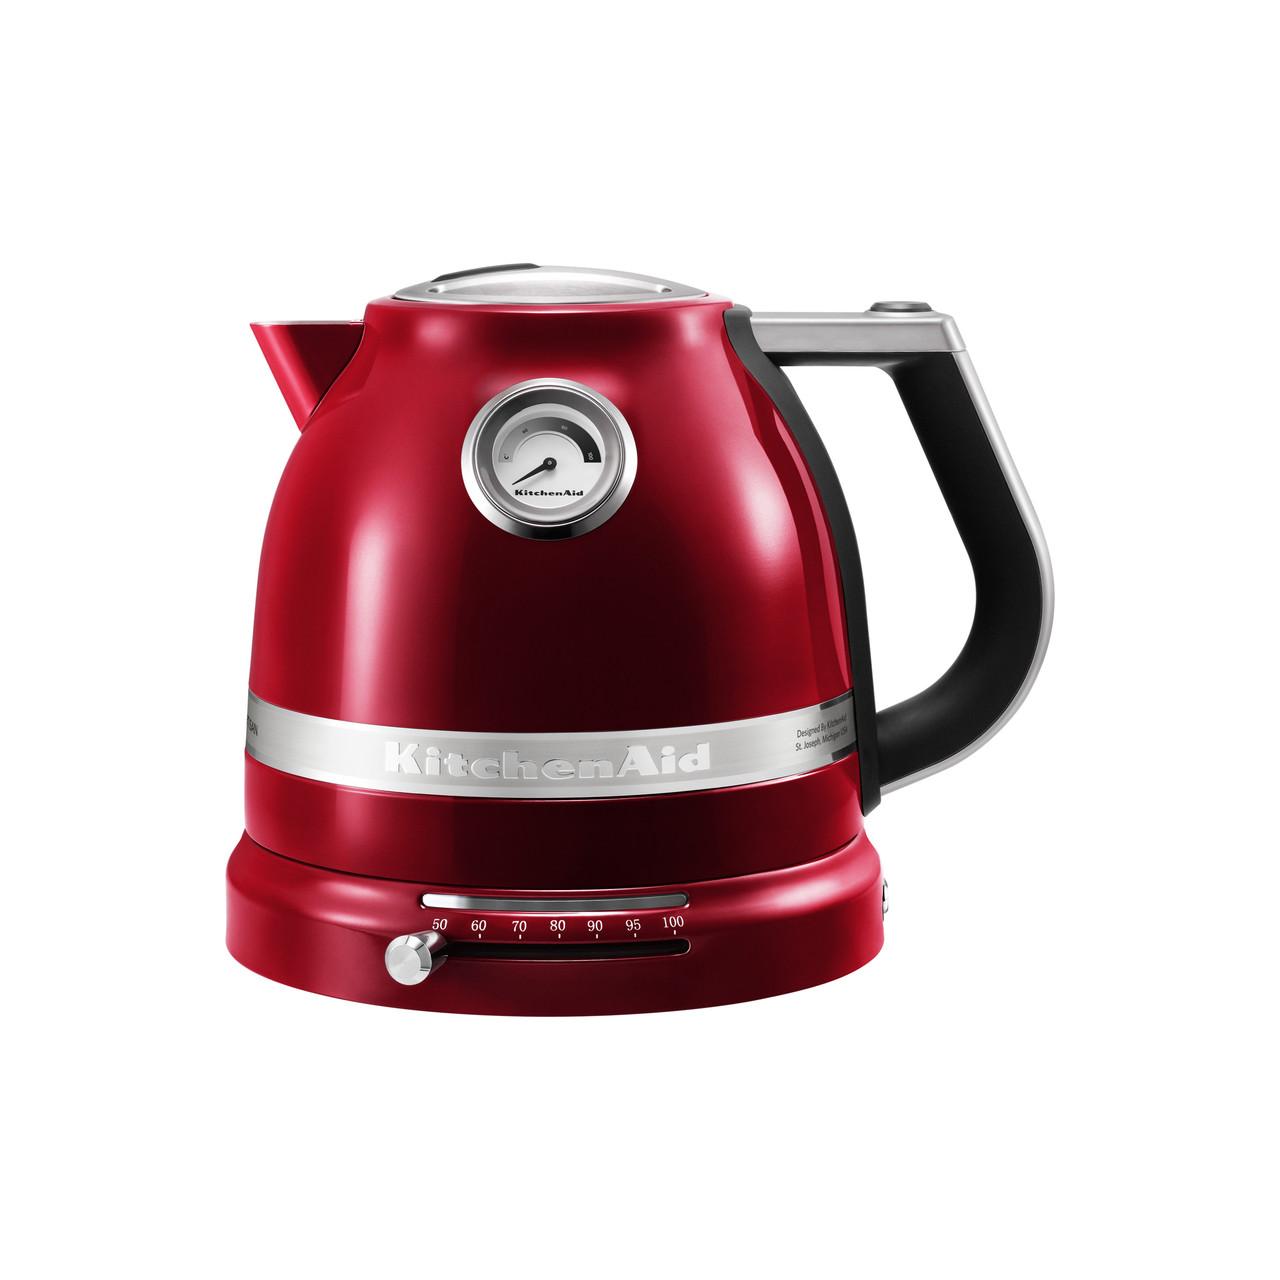 Чайник электрический с фильтром 1.5 л KitchenAid ARTISAN 1.5 L Kettle 5KEK1522ECA